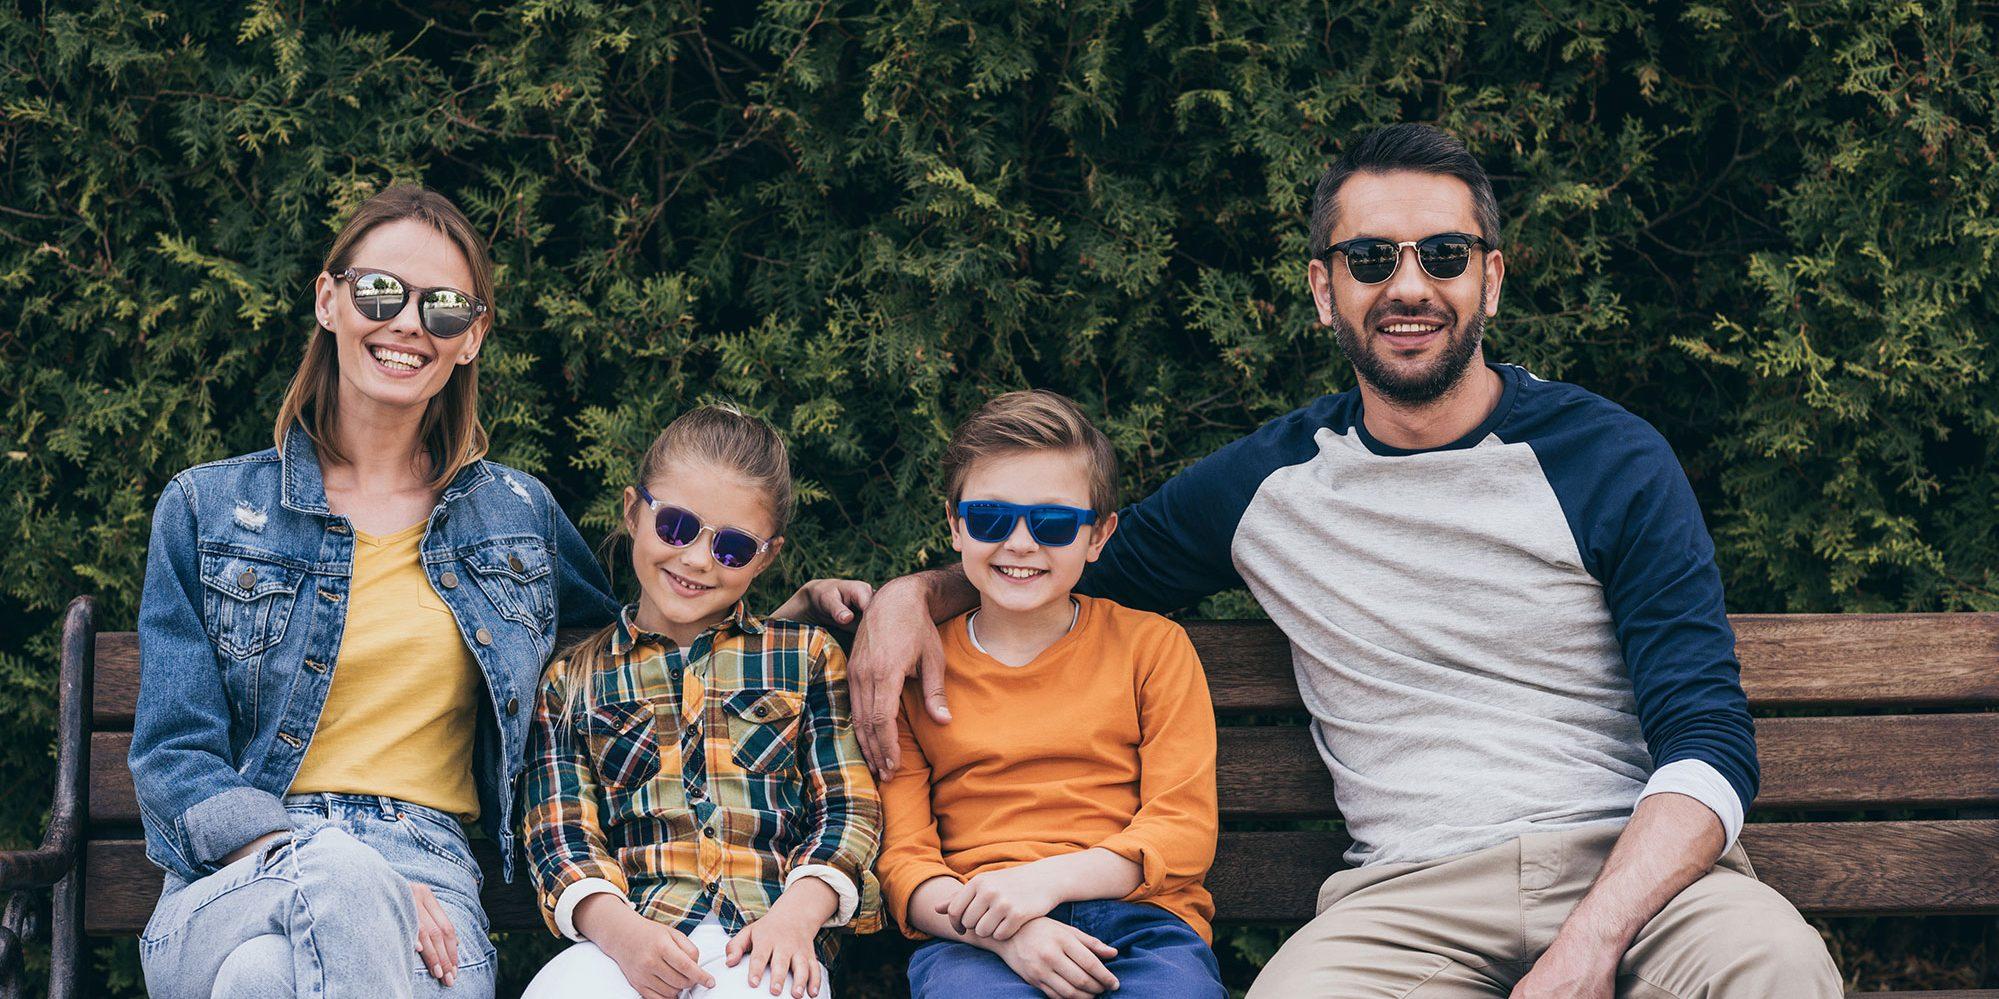 A family outside wearing sunglasses